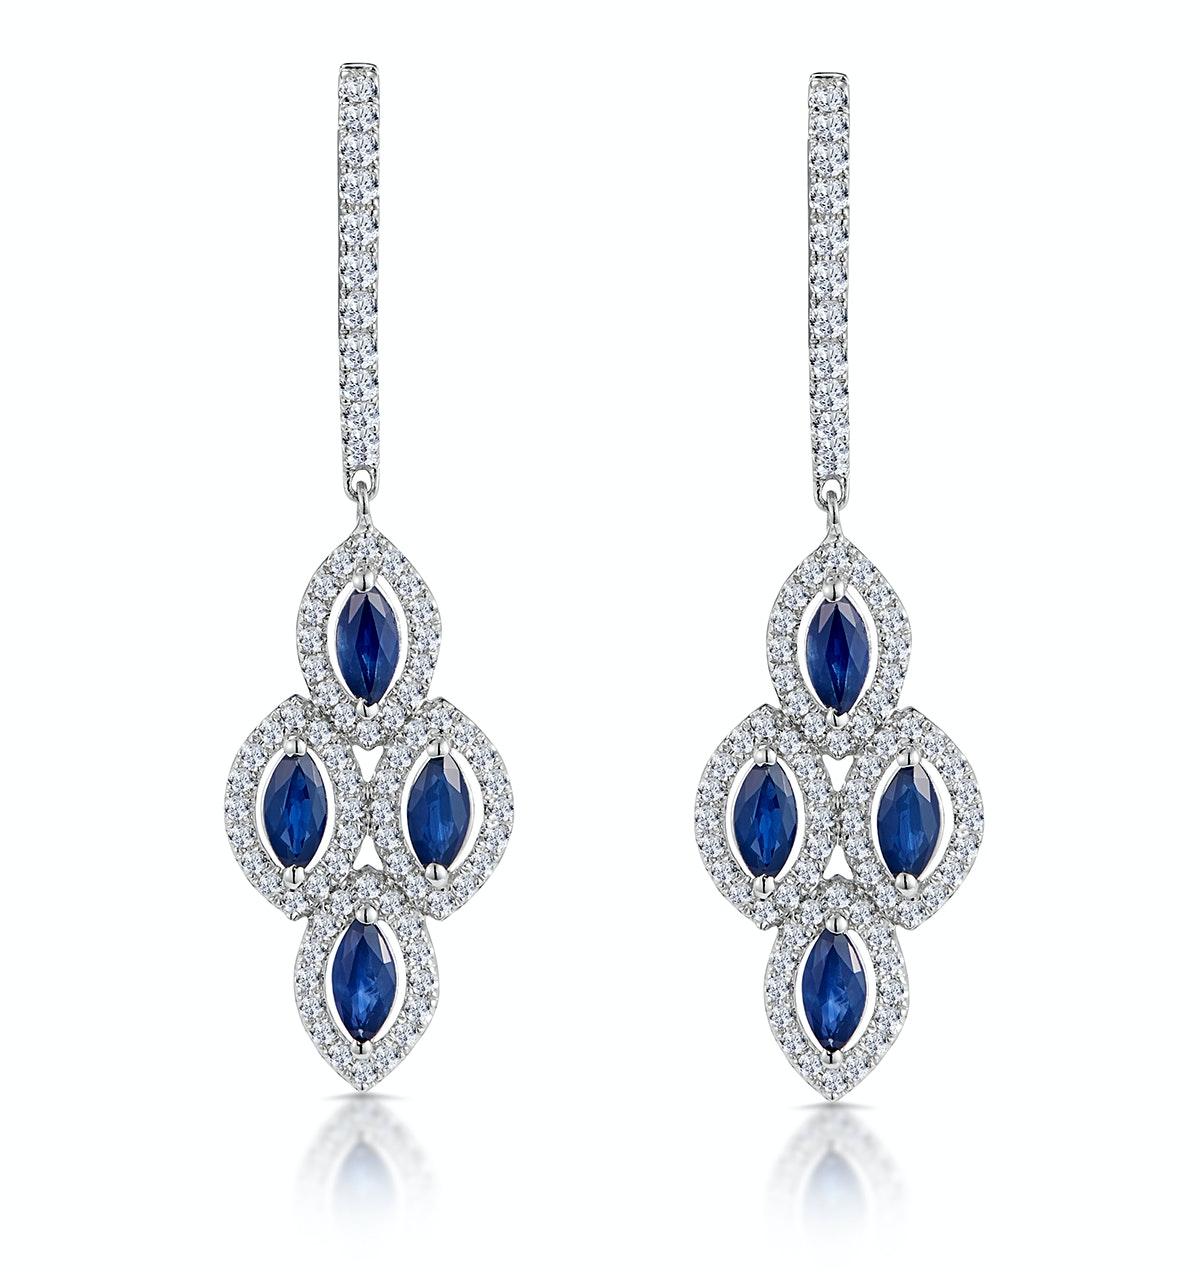 1.45ct Sapphire Asteria Diamond Drop Earrings in 18K White Gold